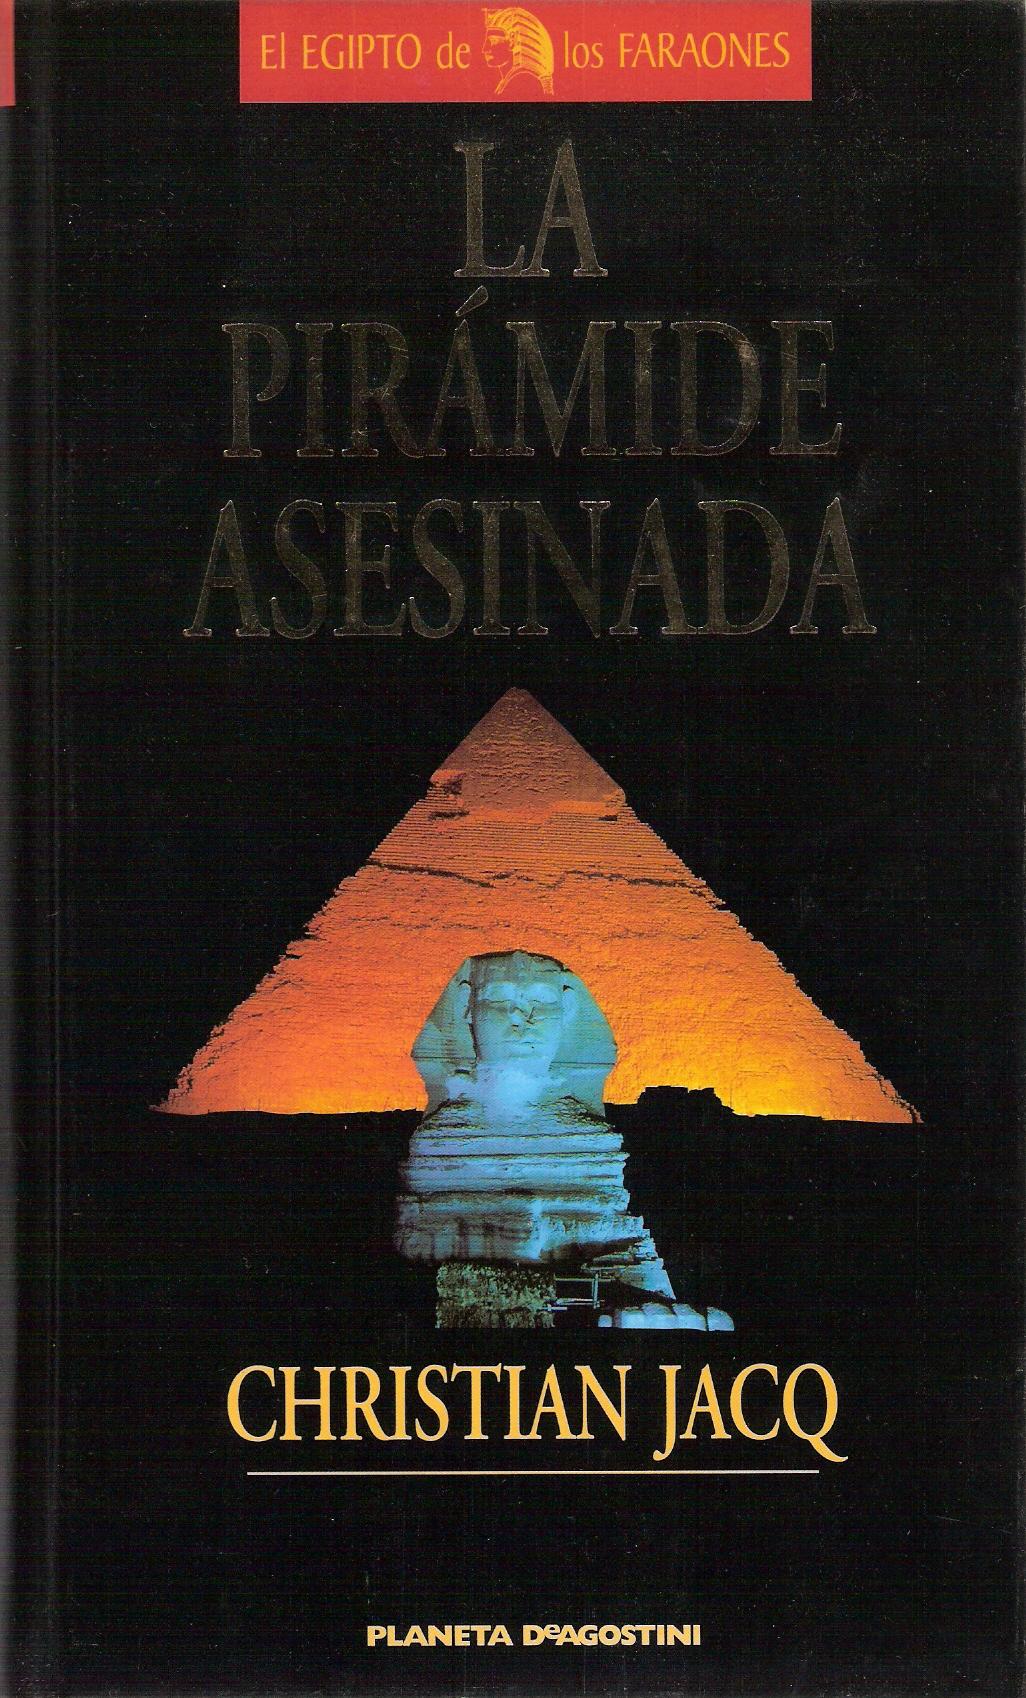 La pirámide asesinada